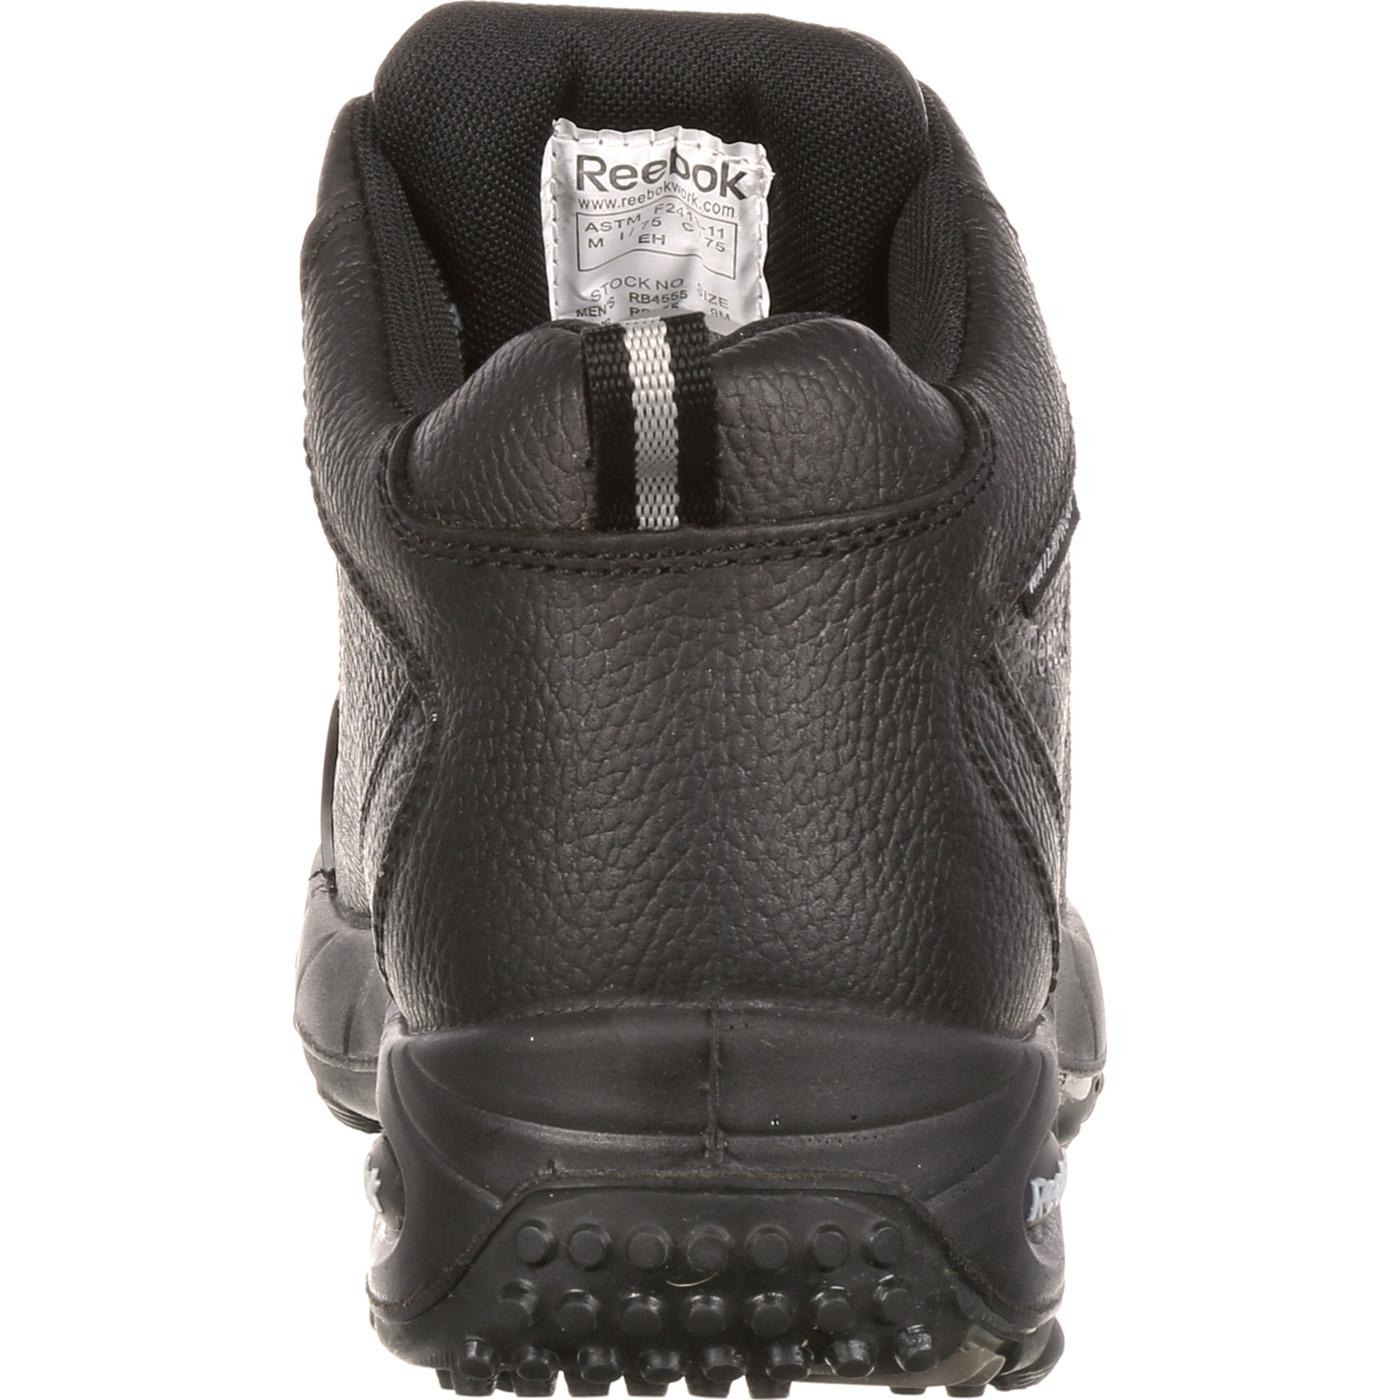 d522535d962 Reebok Tiahawk Composite Toe Waterproof Hiker Work Boot